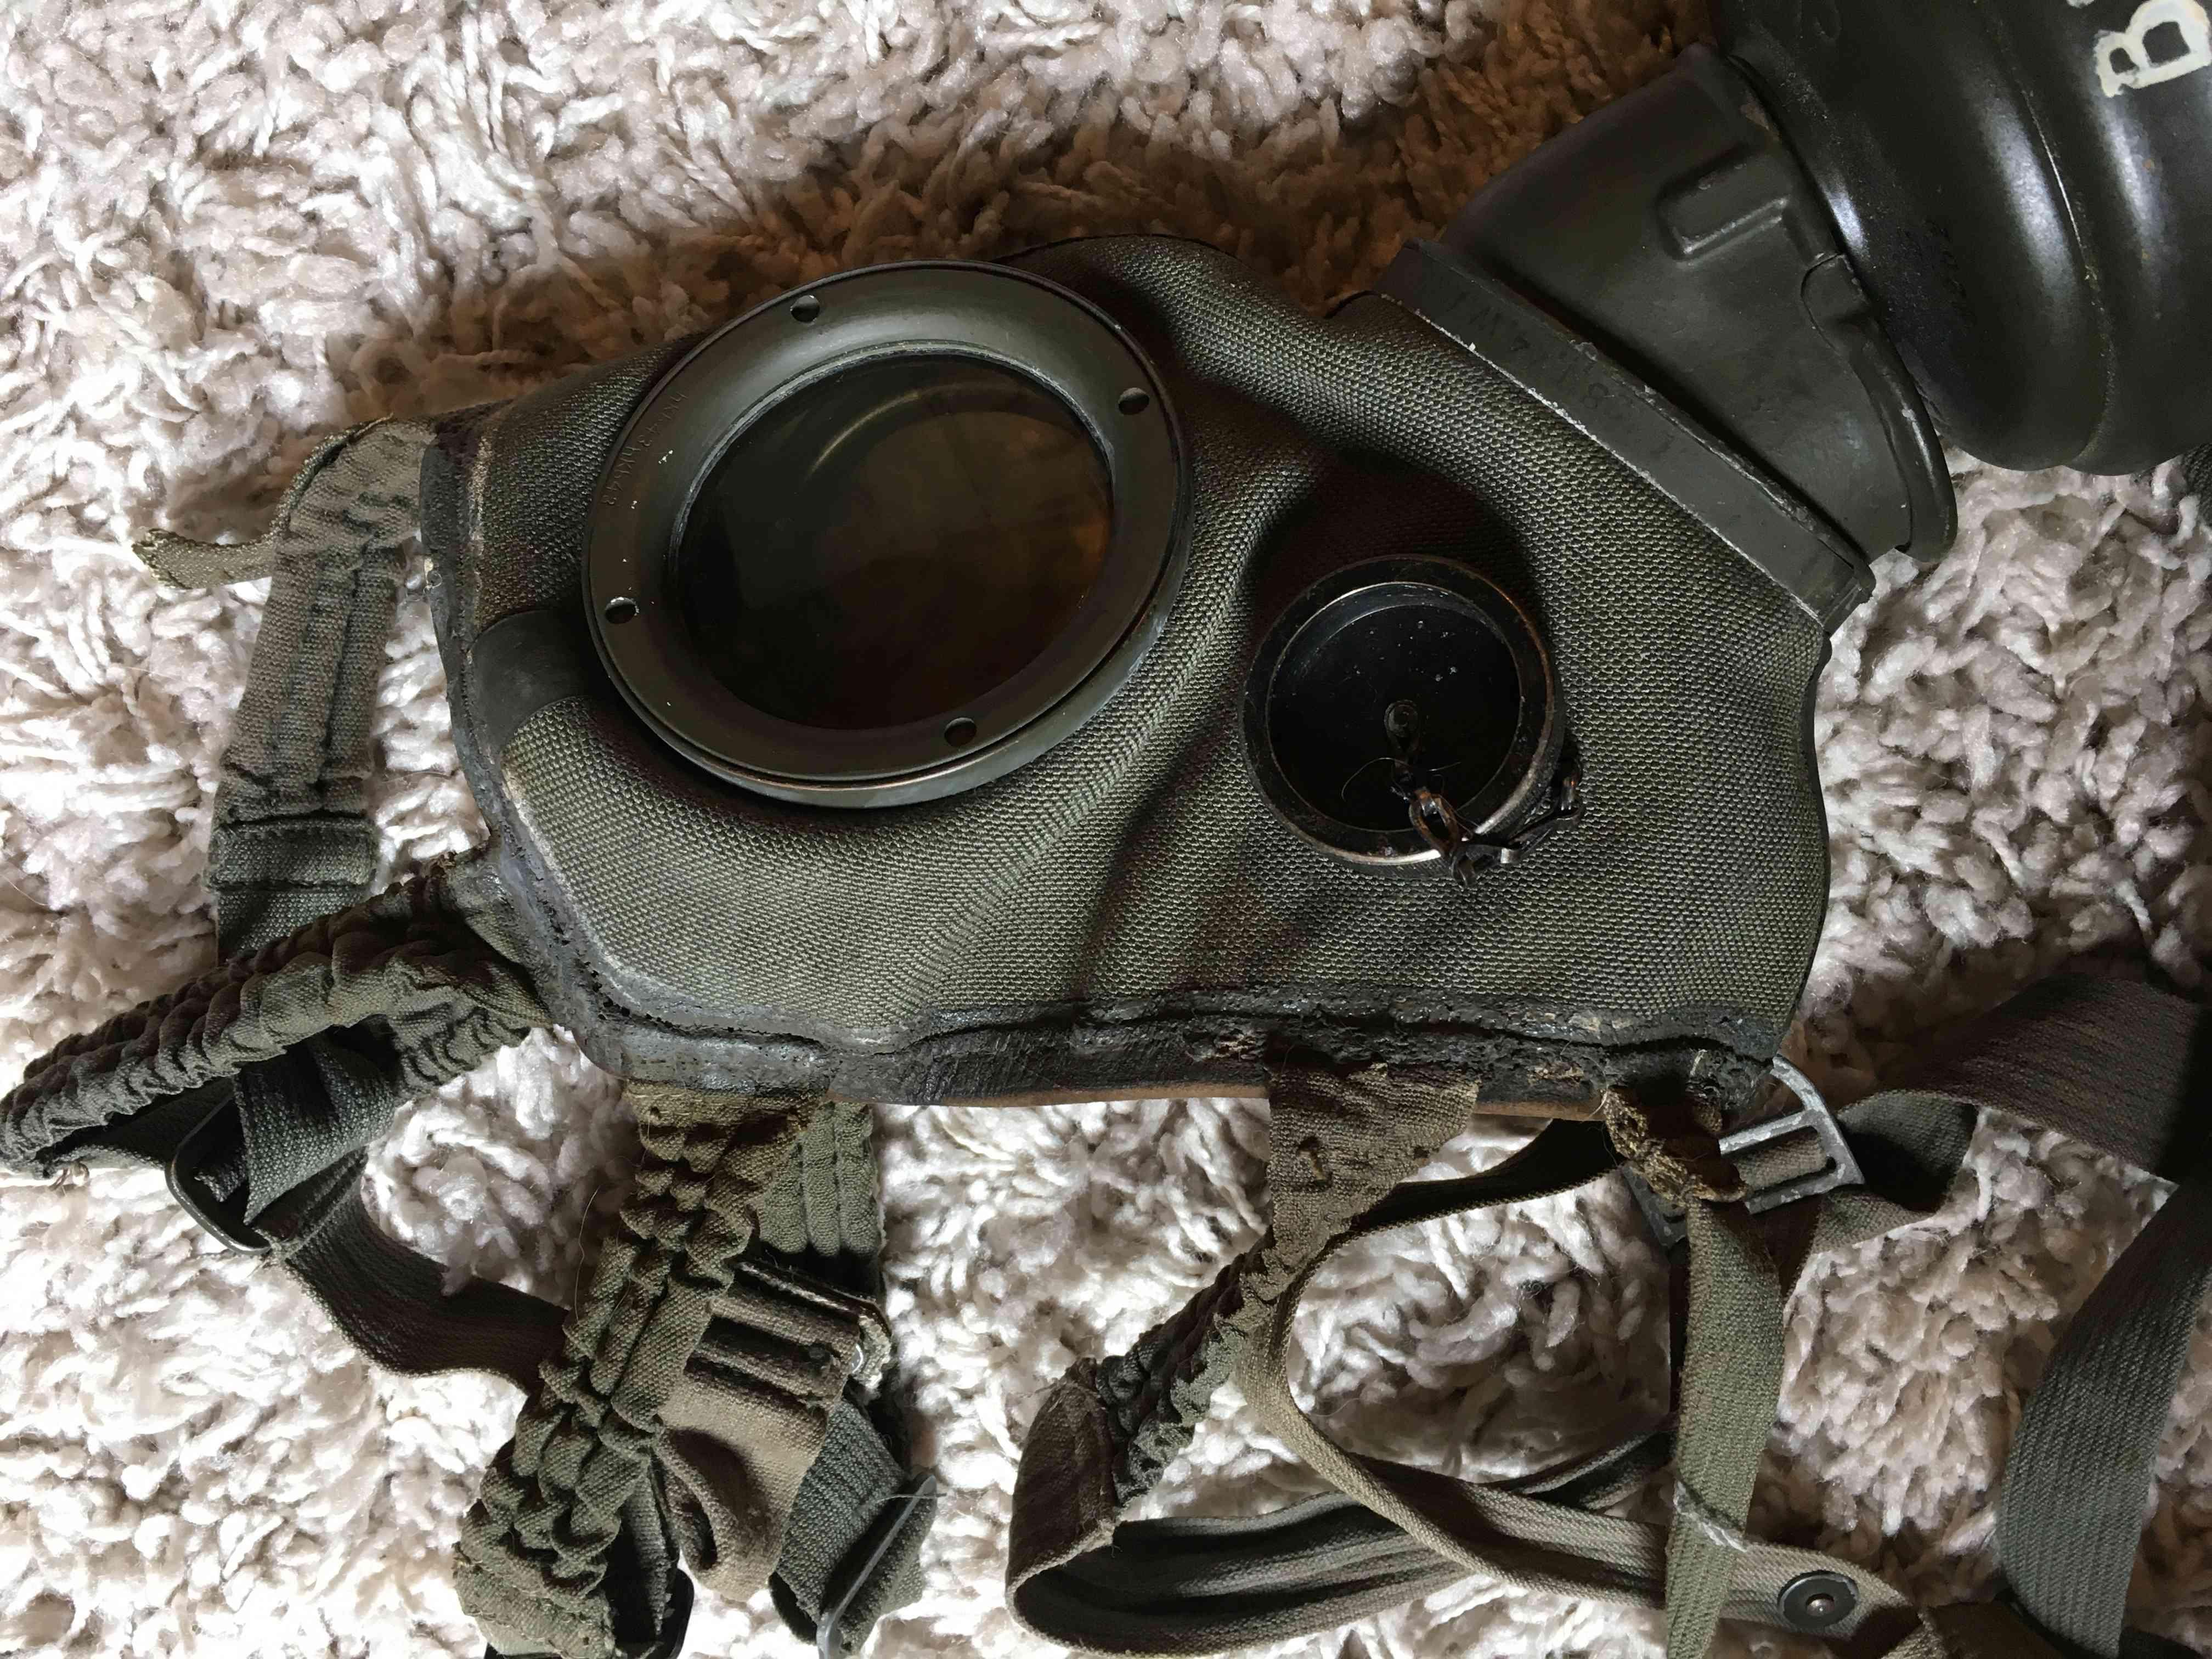 Masque a gaz allemand seconde guerre mondiale. Img_2925